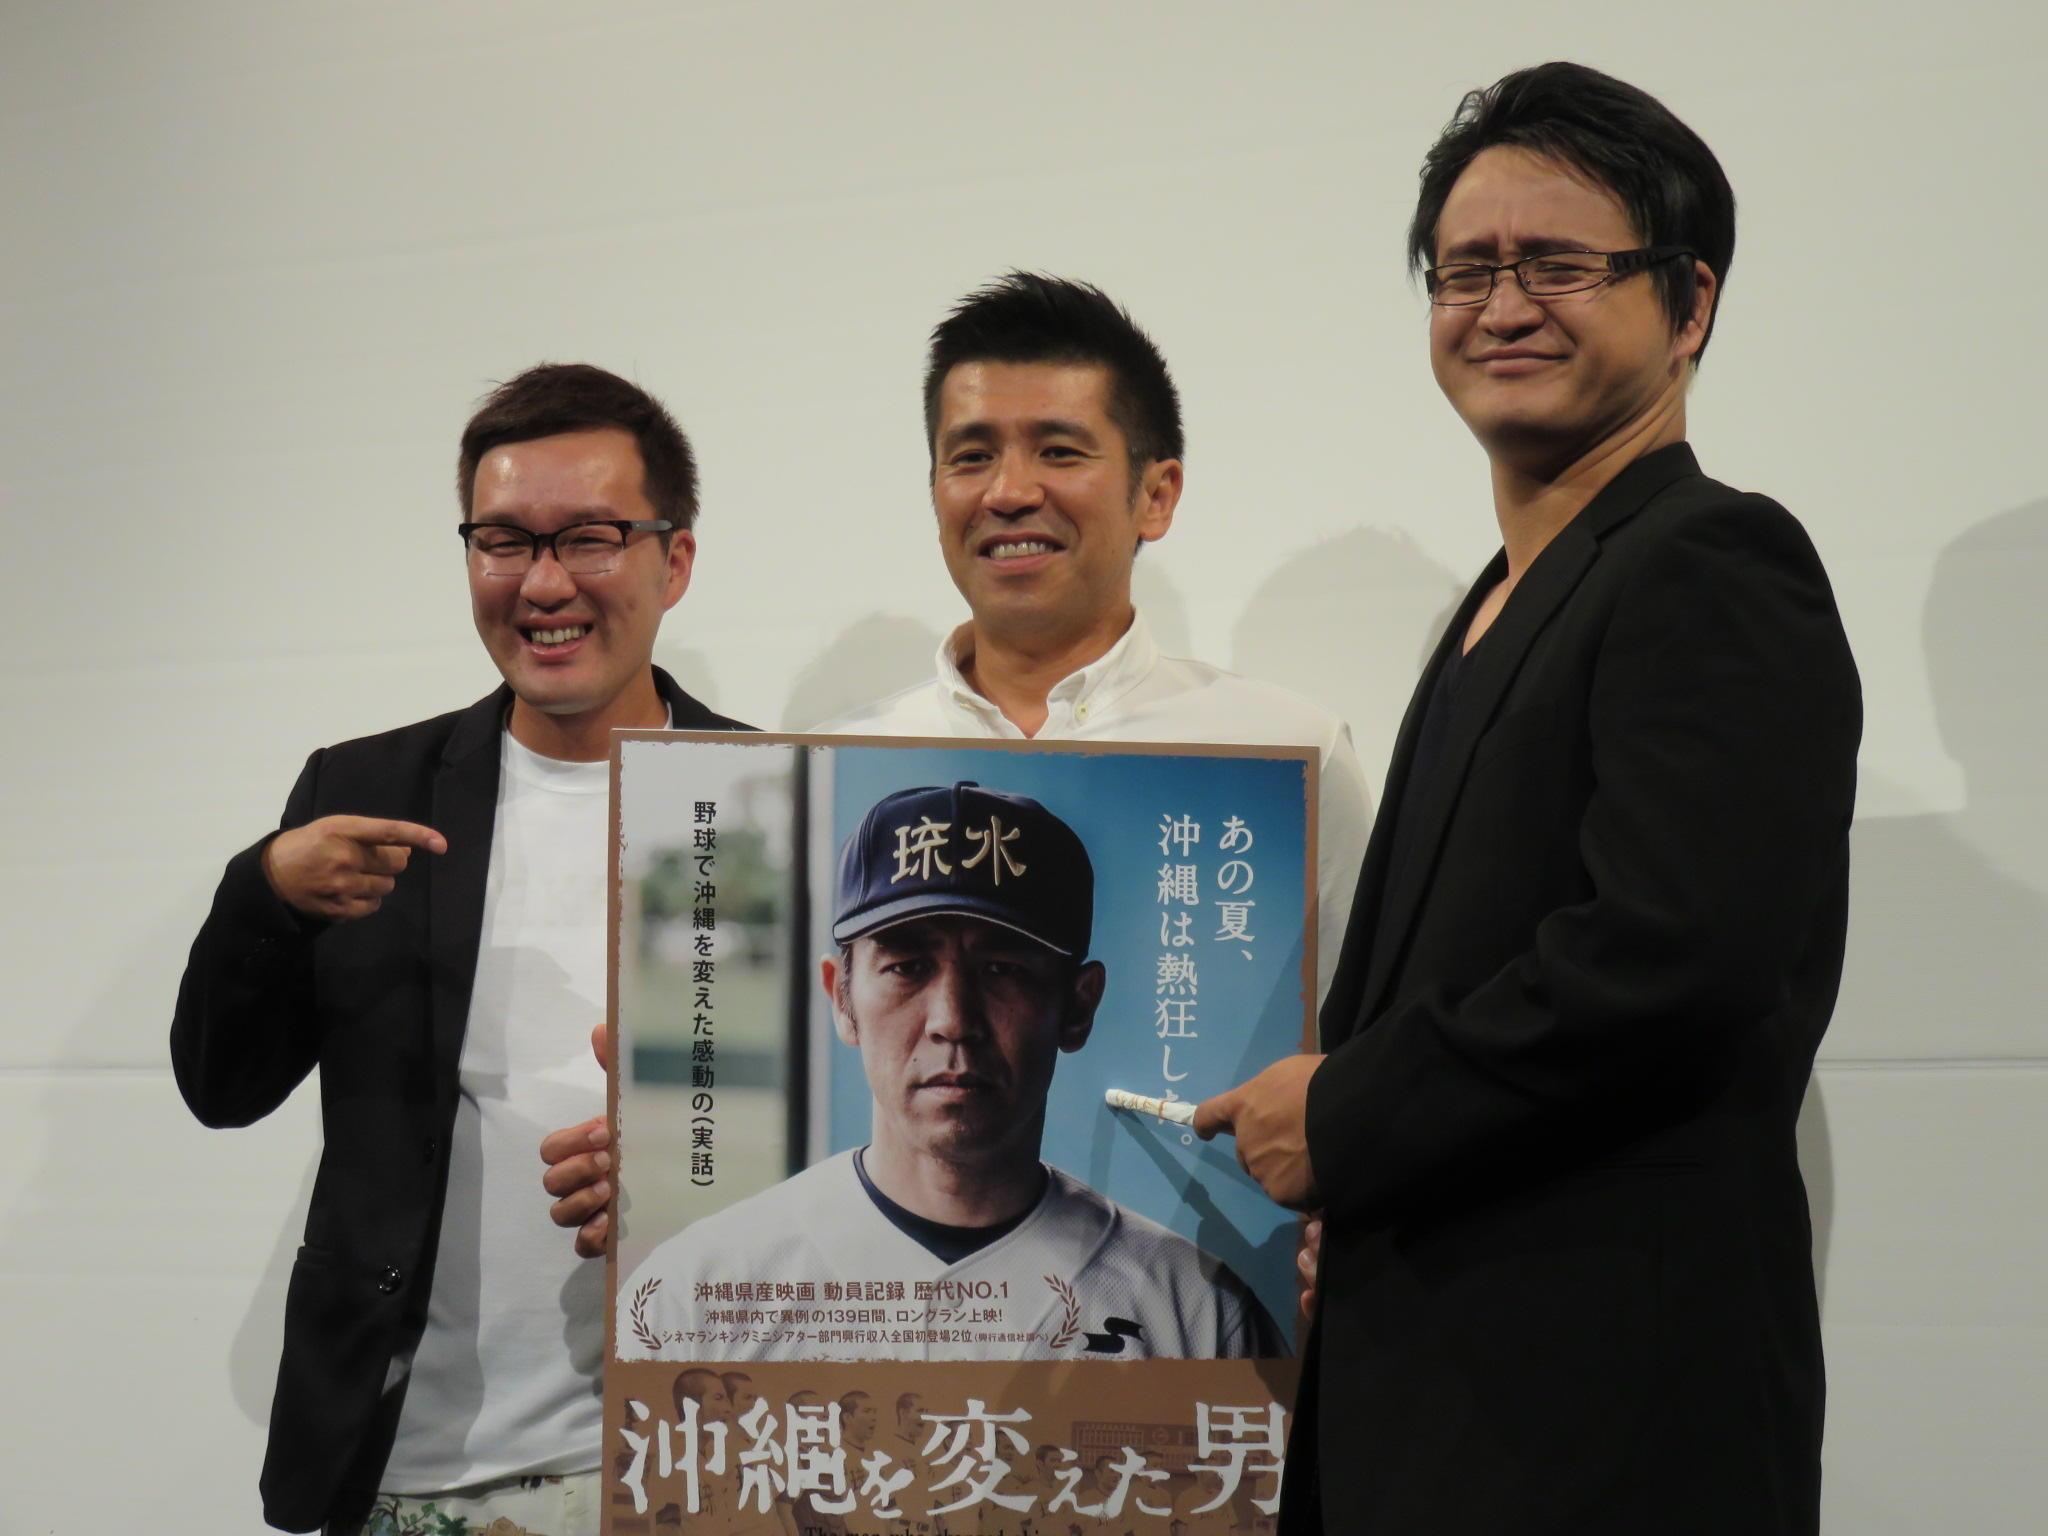 http://news.yoshimoto.co.jp/20170728223533-aab117a7de96cd39bca377b1e80377116ab5d1cc.jpg